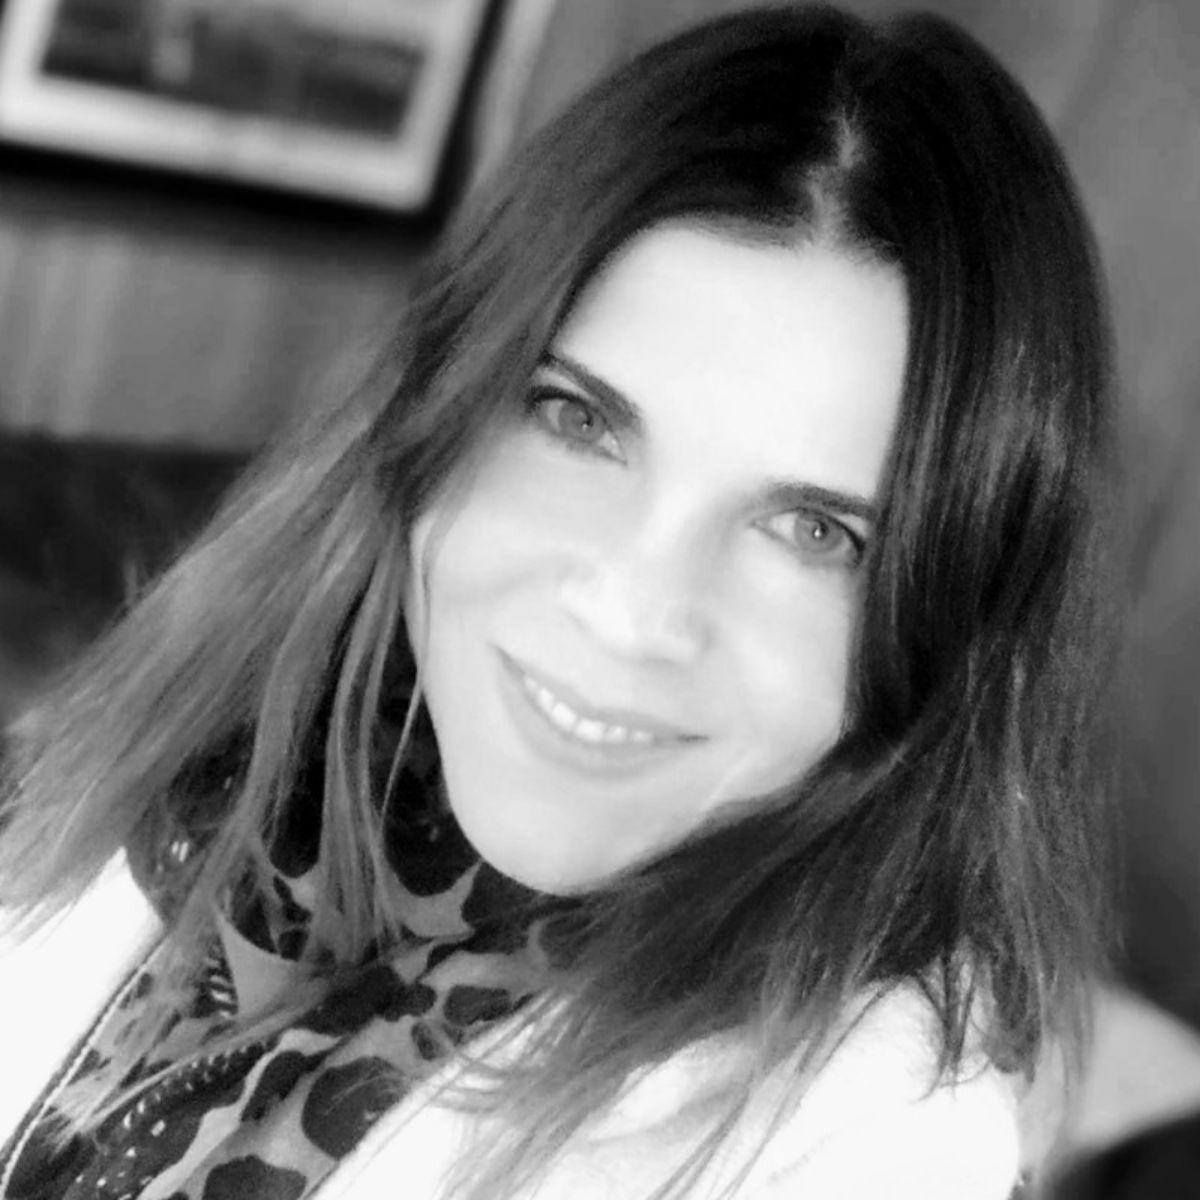 Ana Torralba